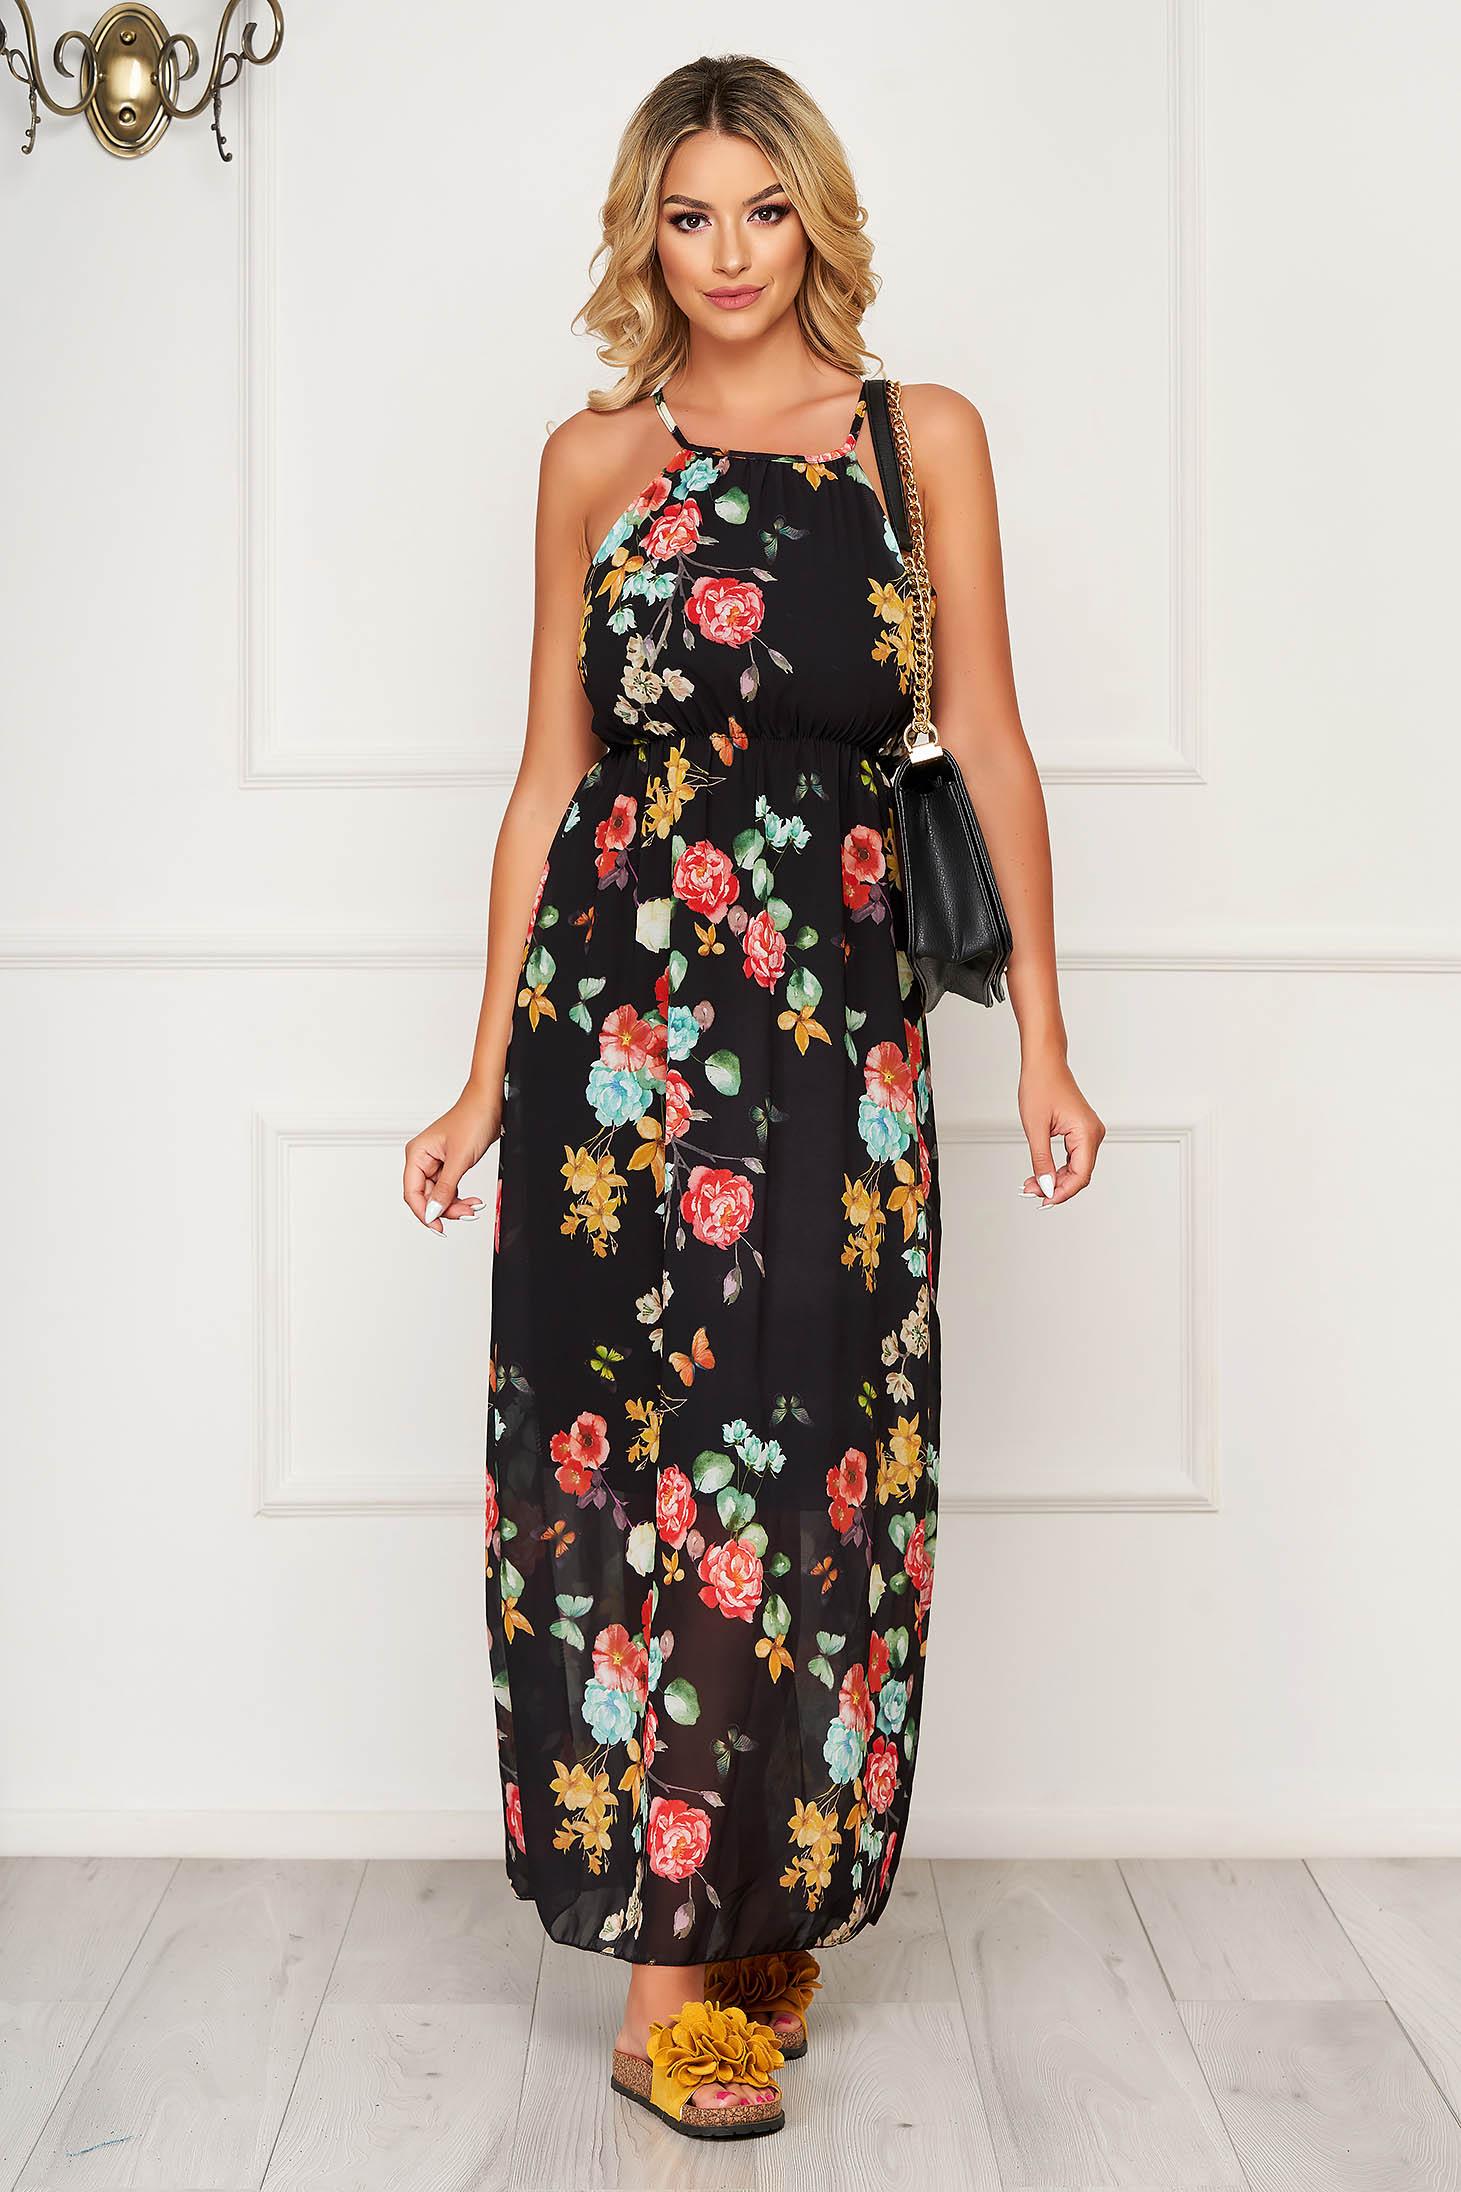 Black dress long daily from veil fabric cloche with elastic waist sleeveless